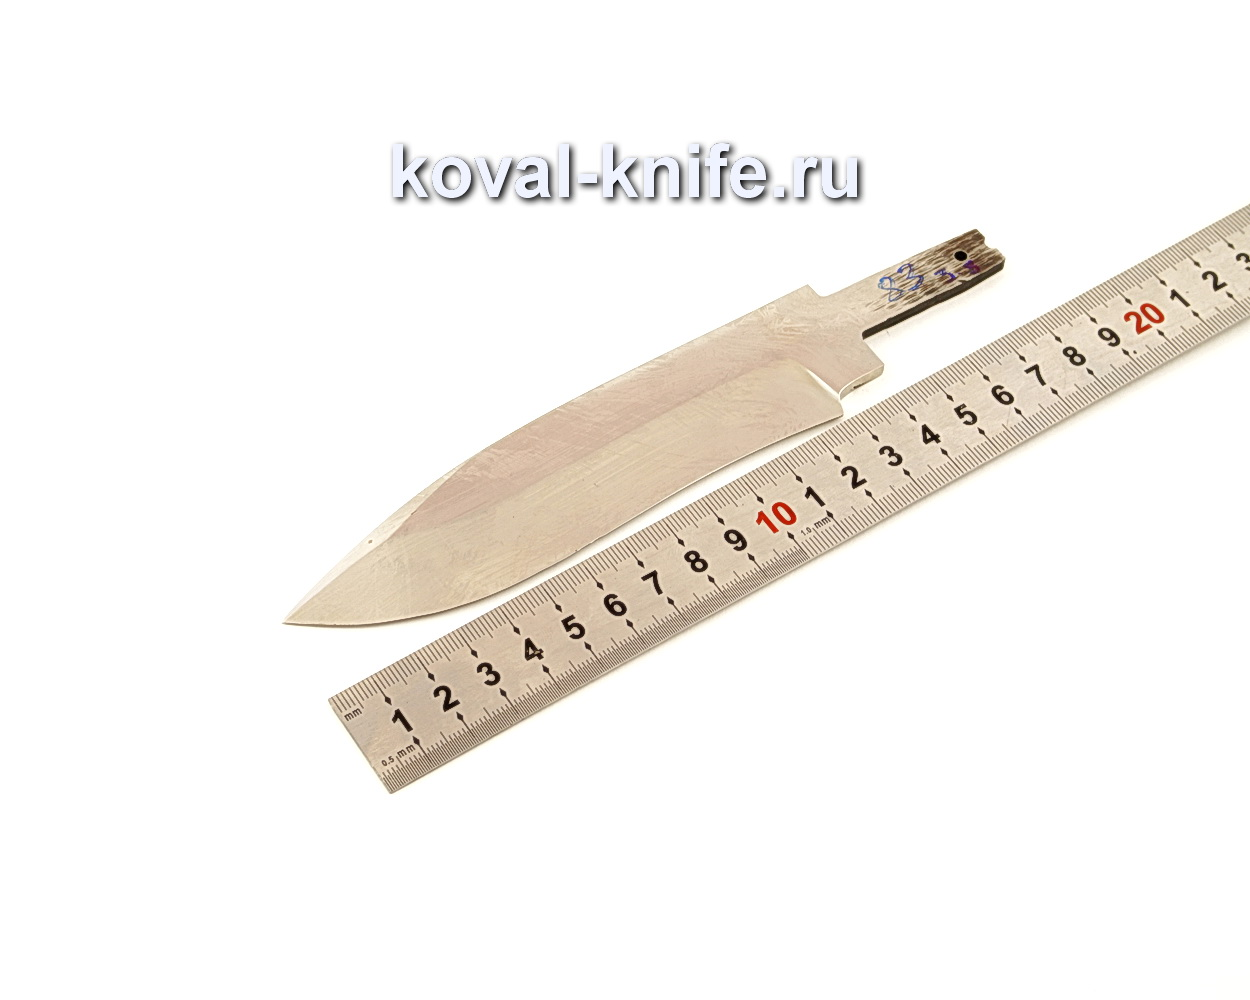 Клинок для ножа из кованой стали Х12МФ N83